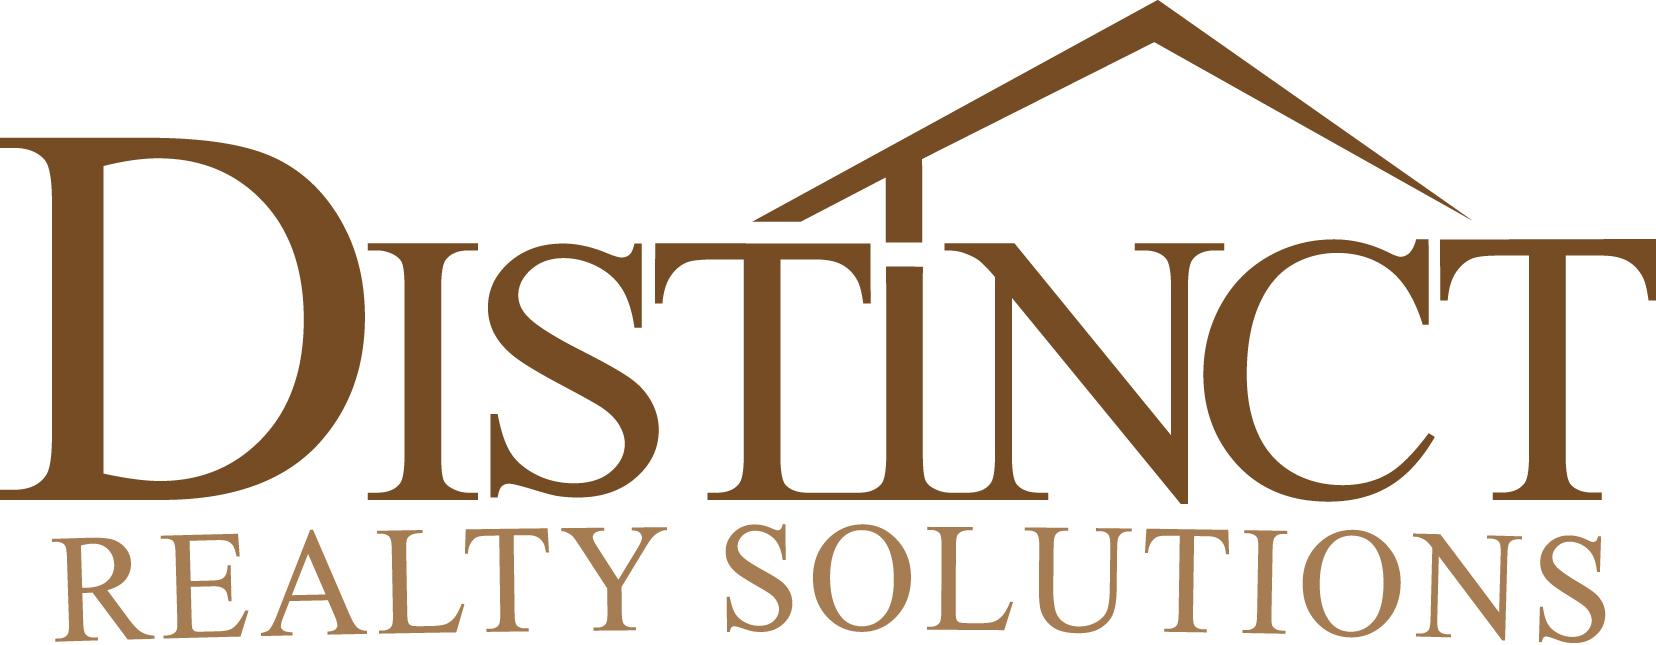 Distinct Realty Solutions, LLC